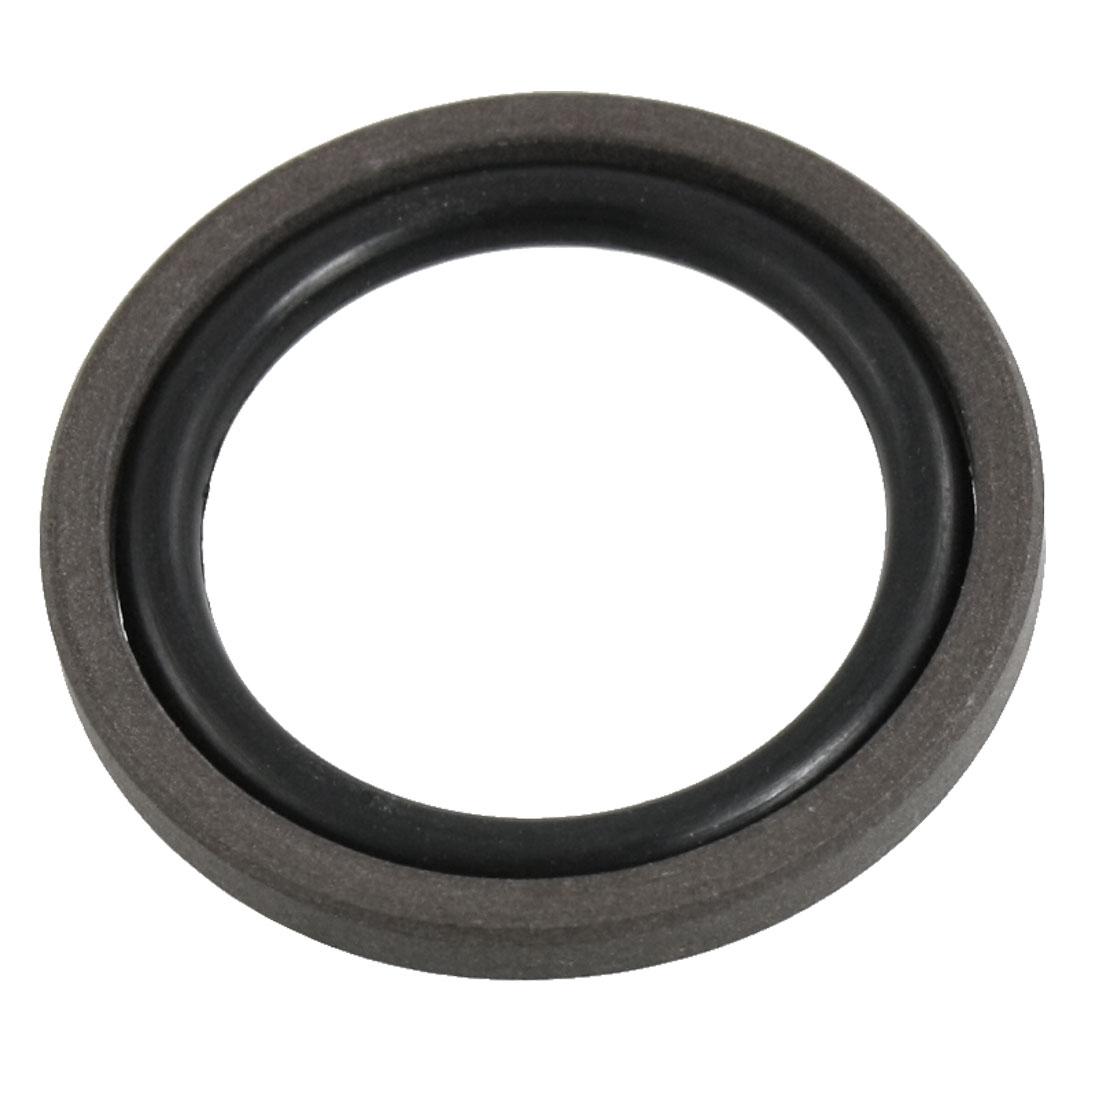 40x32.5x3.2mm NBR PTFE Hydraulic Piston Seal Glyd Ring